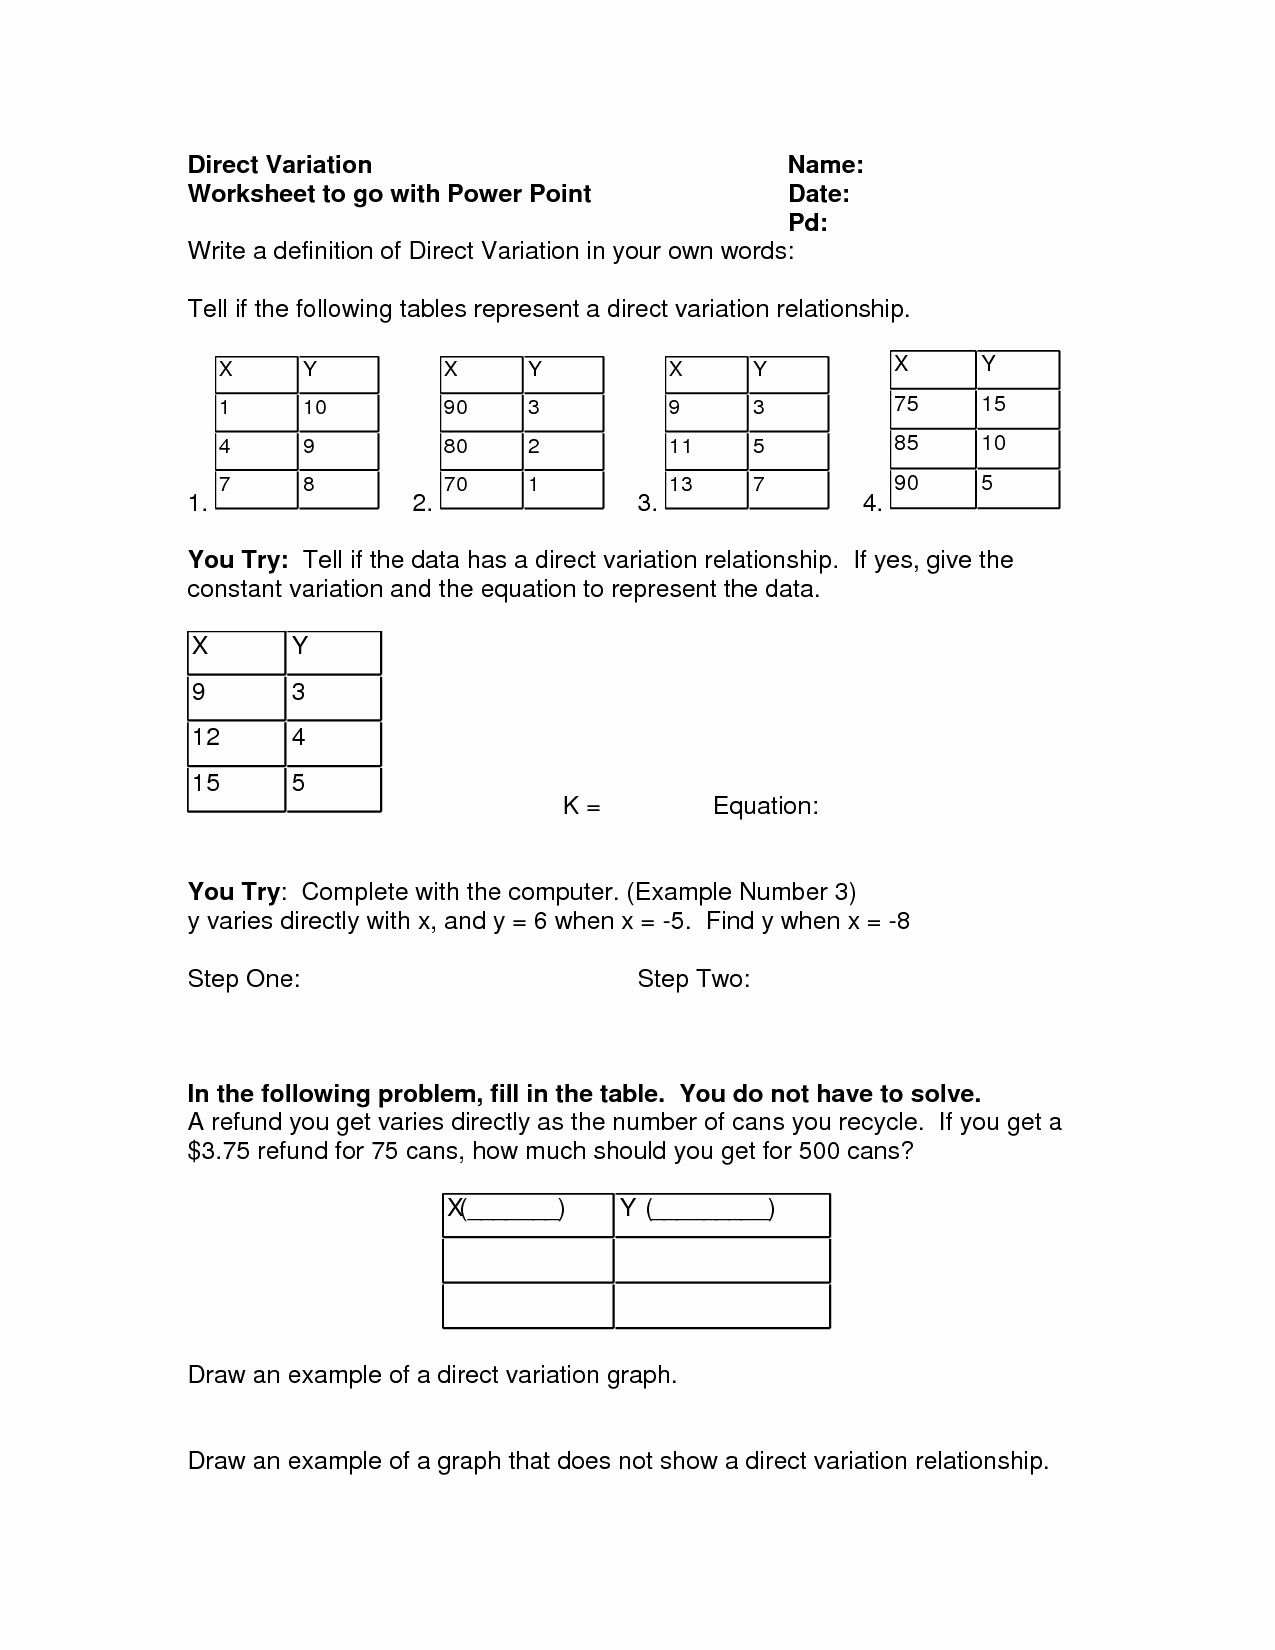 Direct Variation Word Problems Worksheet Fresh 14 Best Of Direct Variation Worksheets Printable